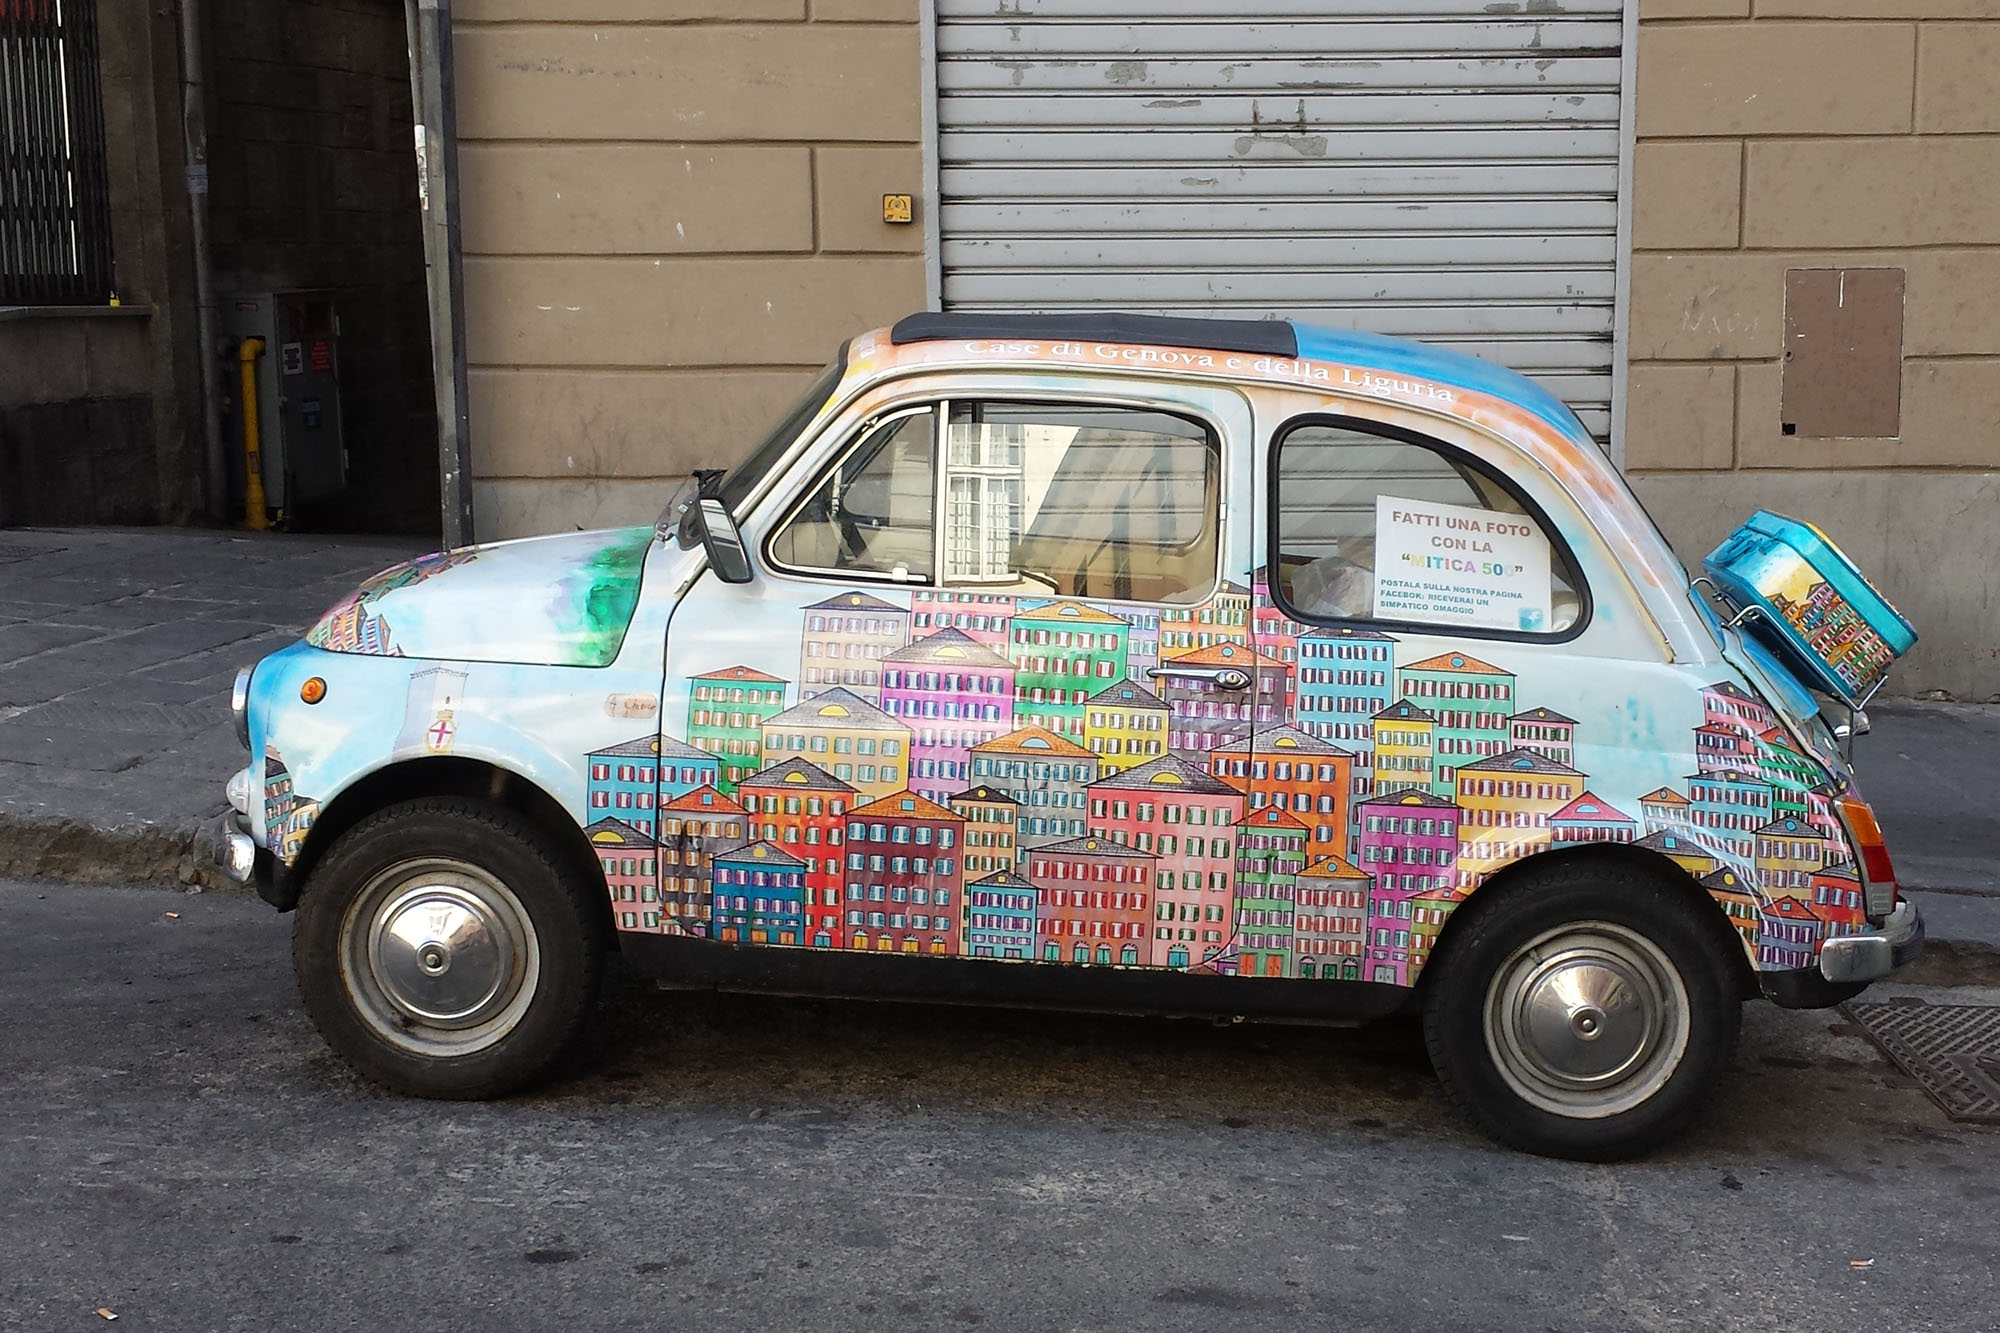 Fiat 500 Genova